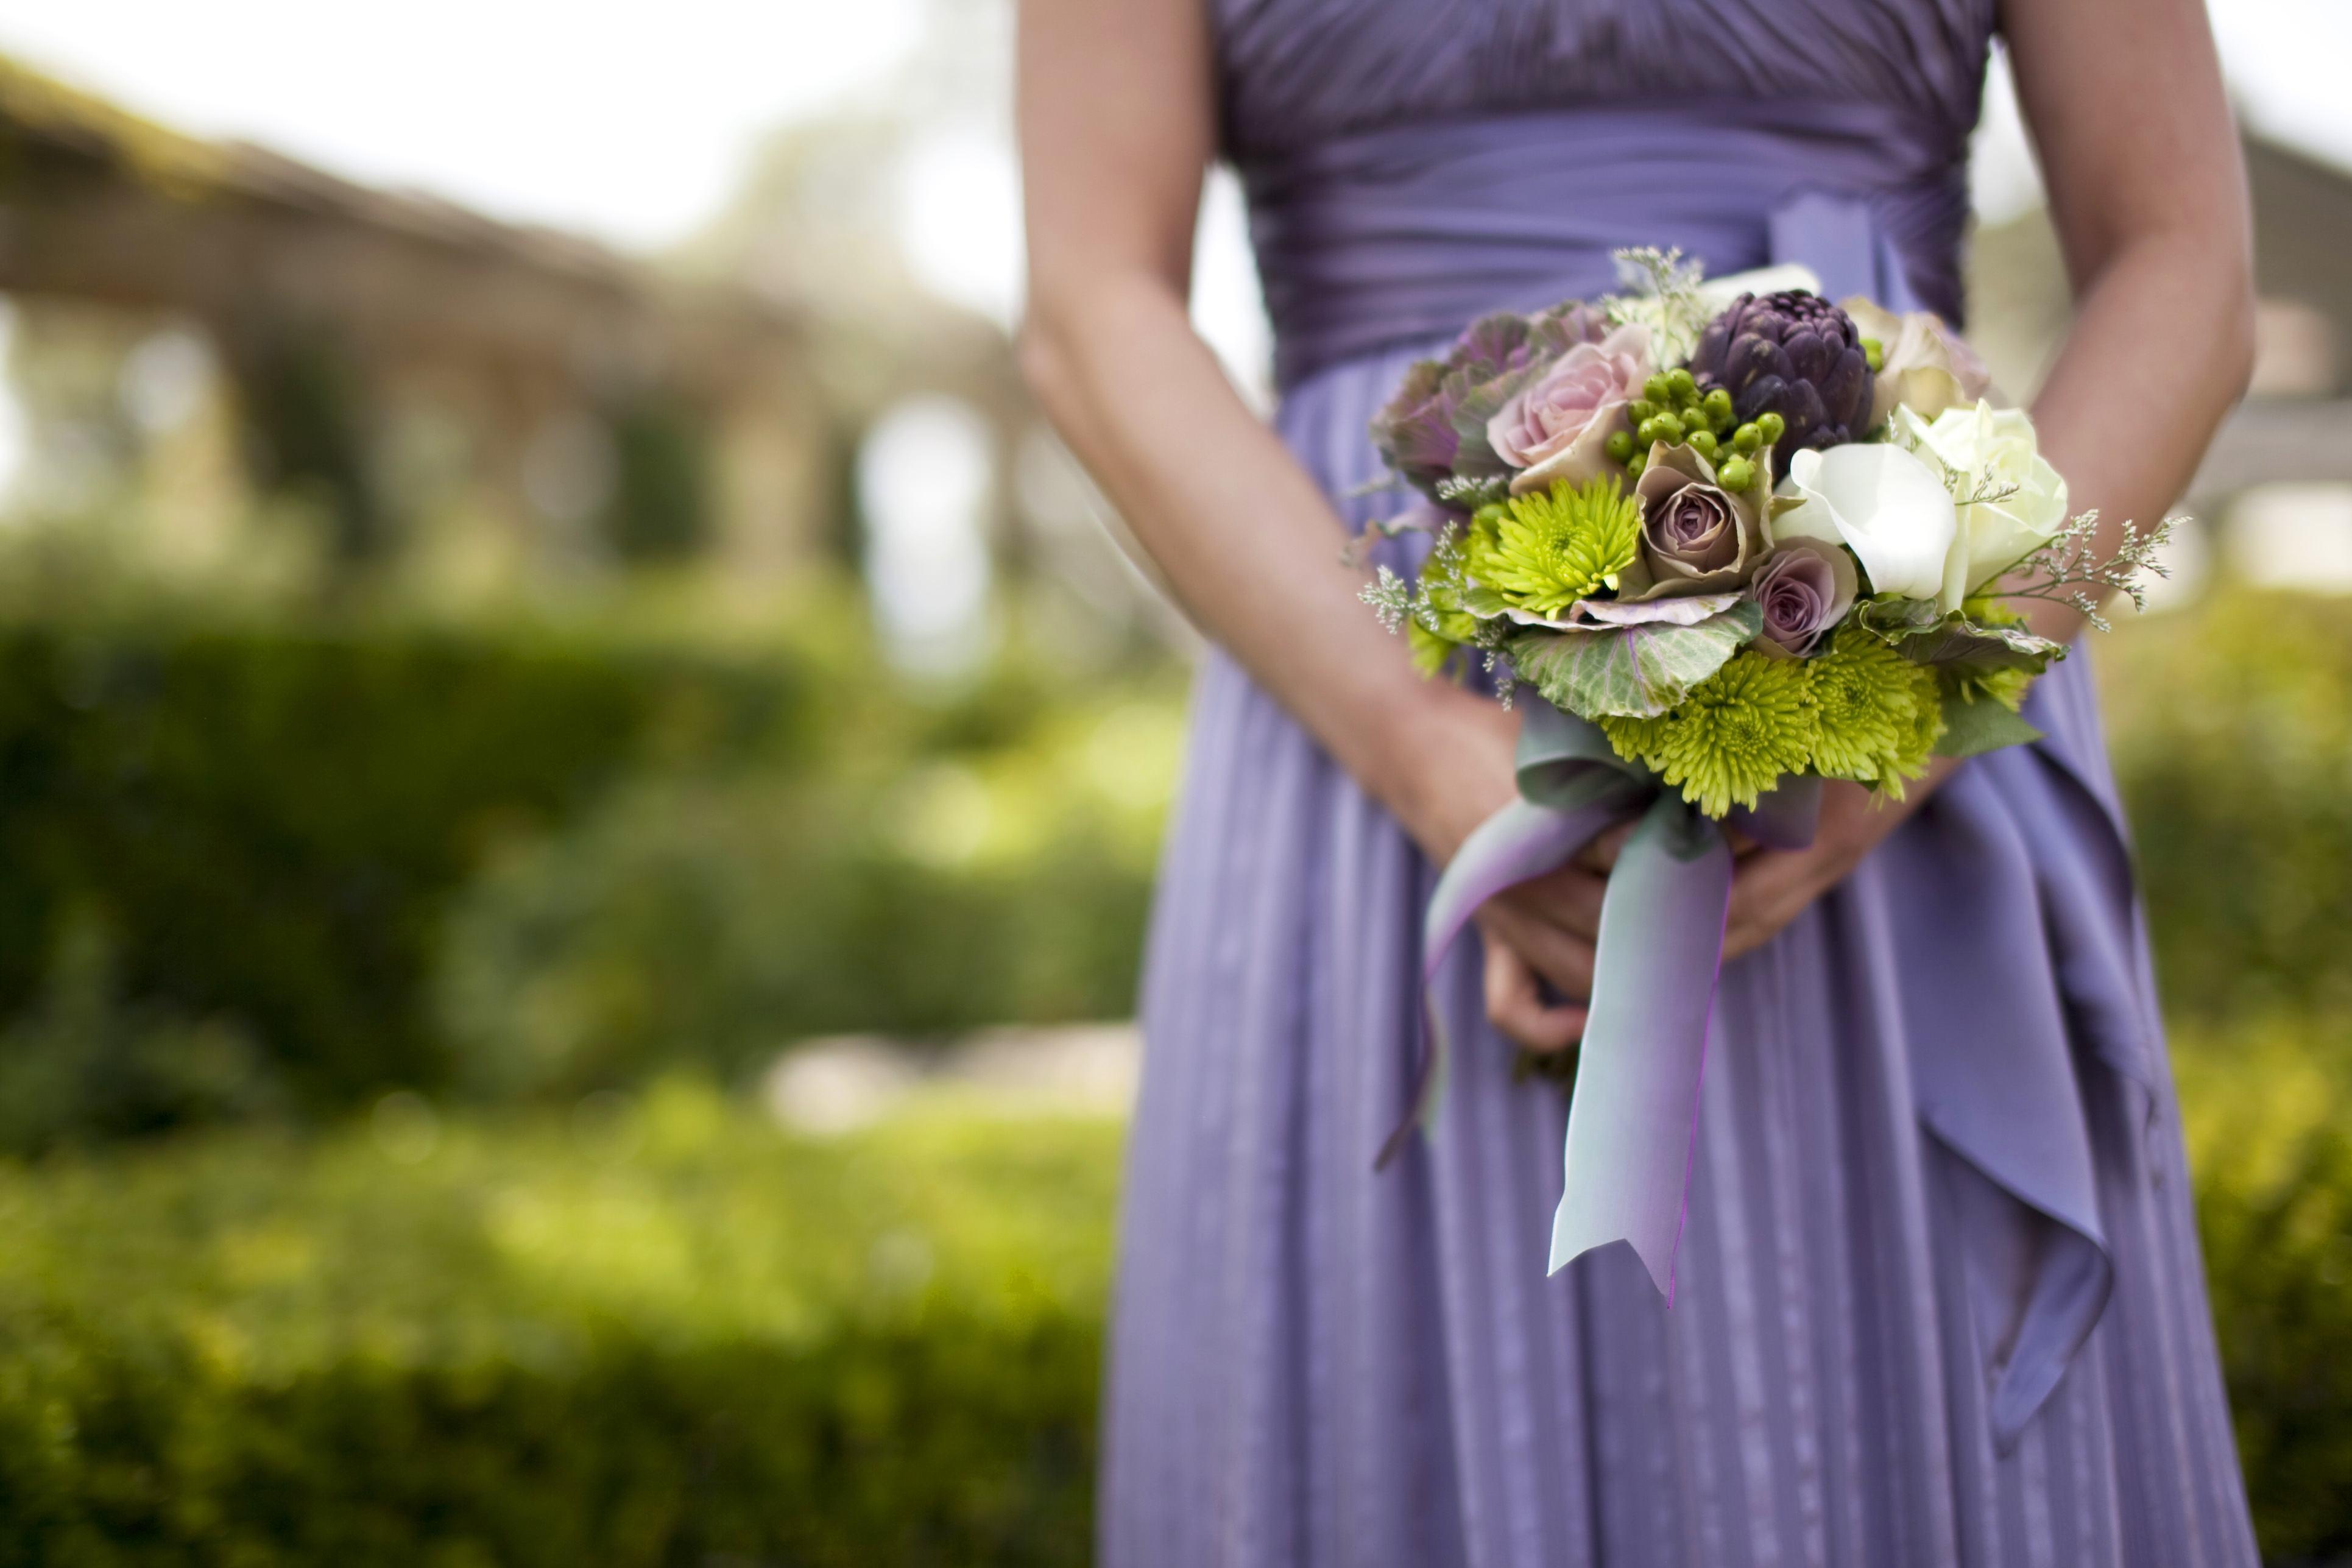 Purple artichoke in bridesmaid bouquet